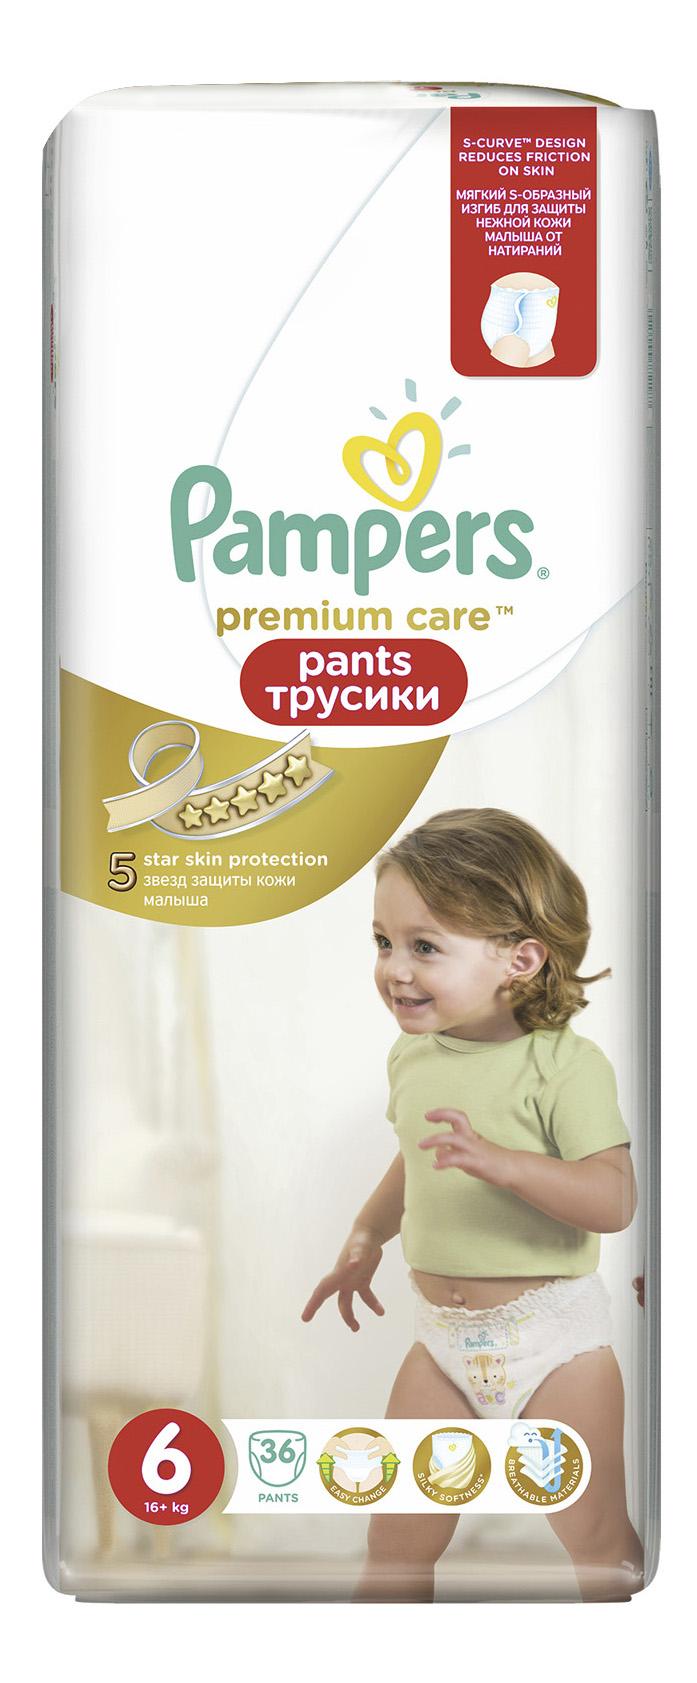 Подгузники-трусики Pampers Premium Care Pants 6 (15 кг+), 36 шт.